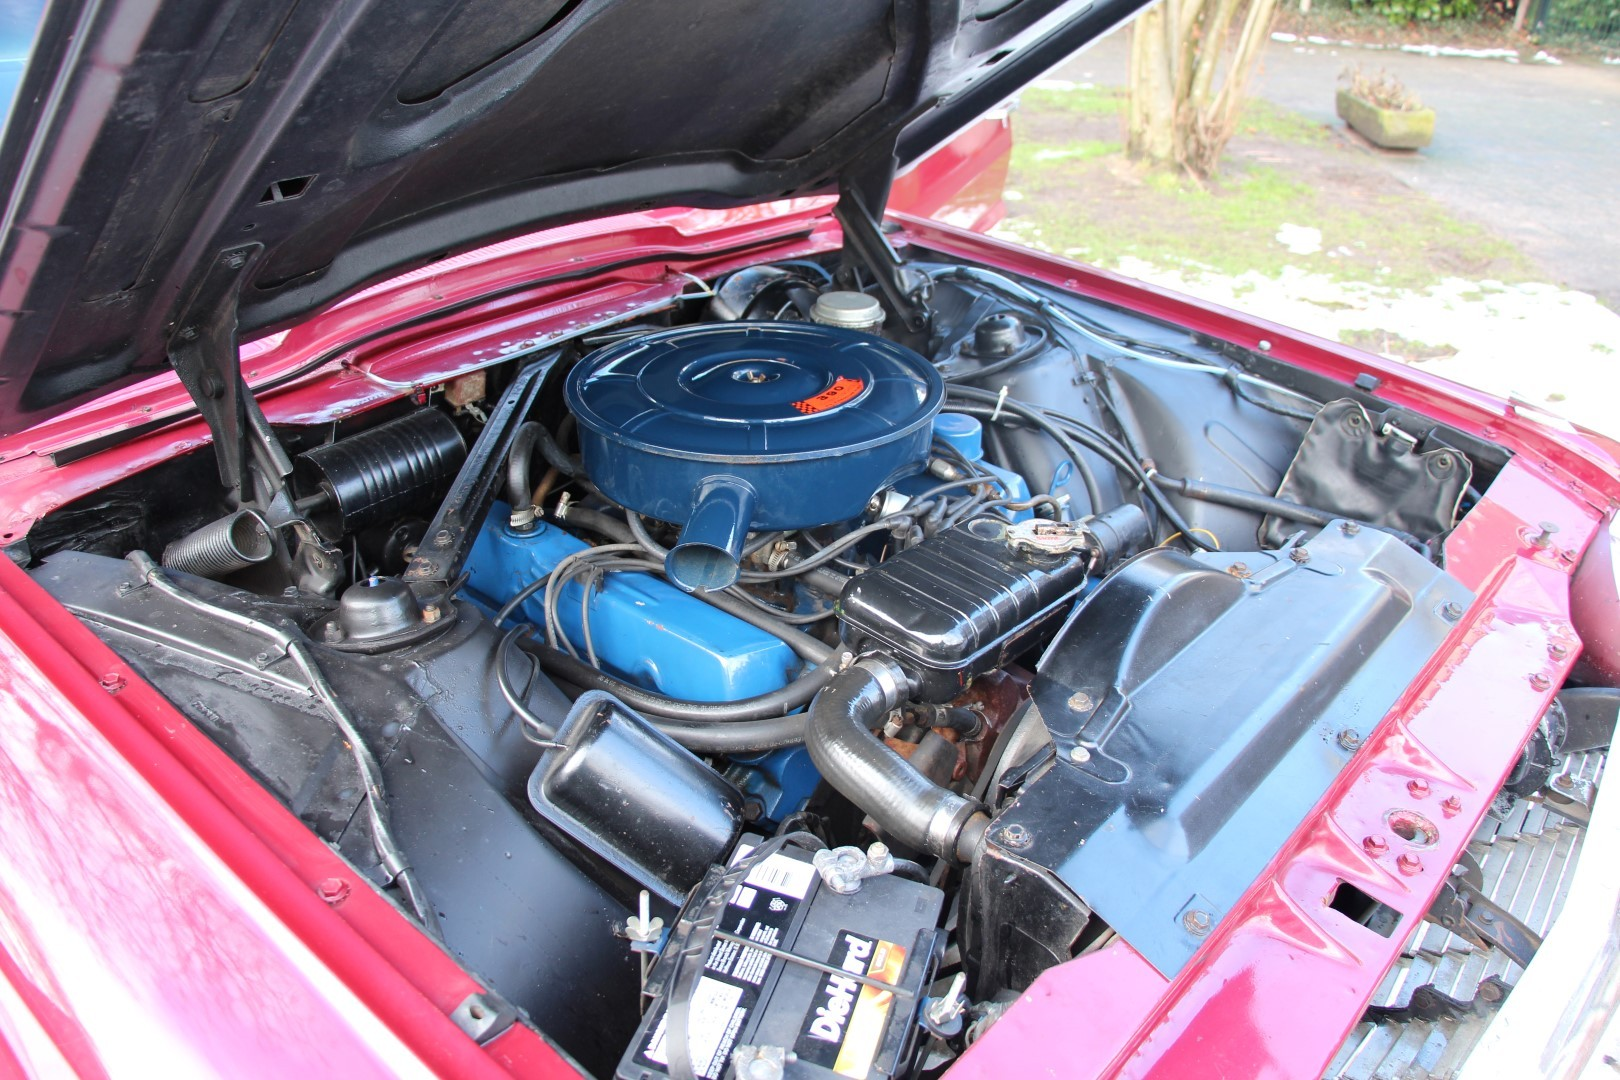 1965 Ford Thunderbird Hardtop - Burgundy new (8)